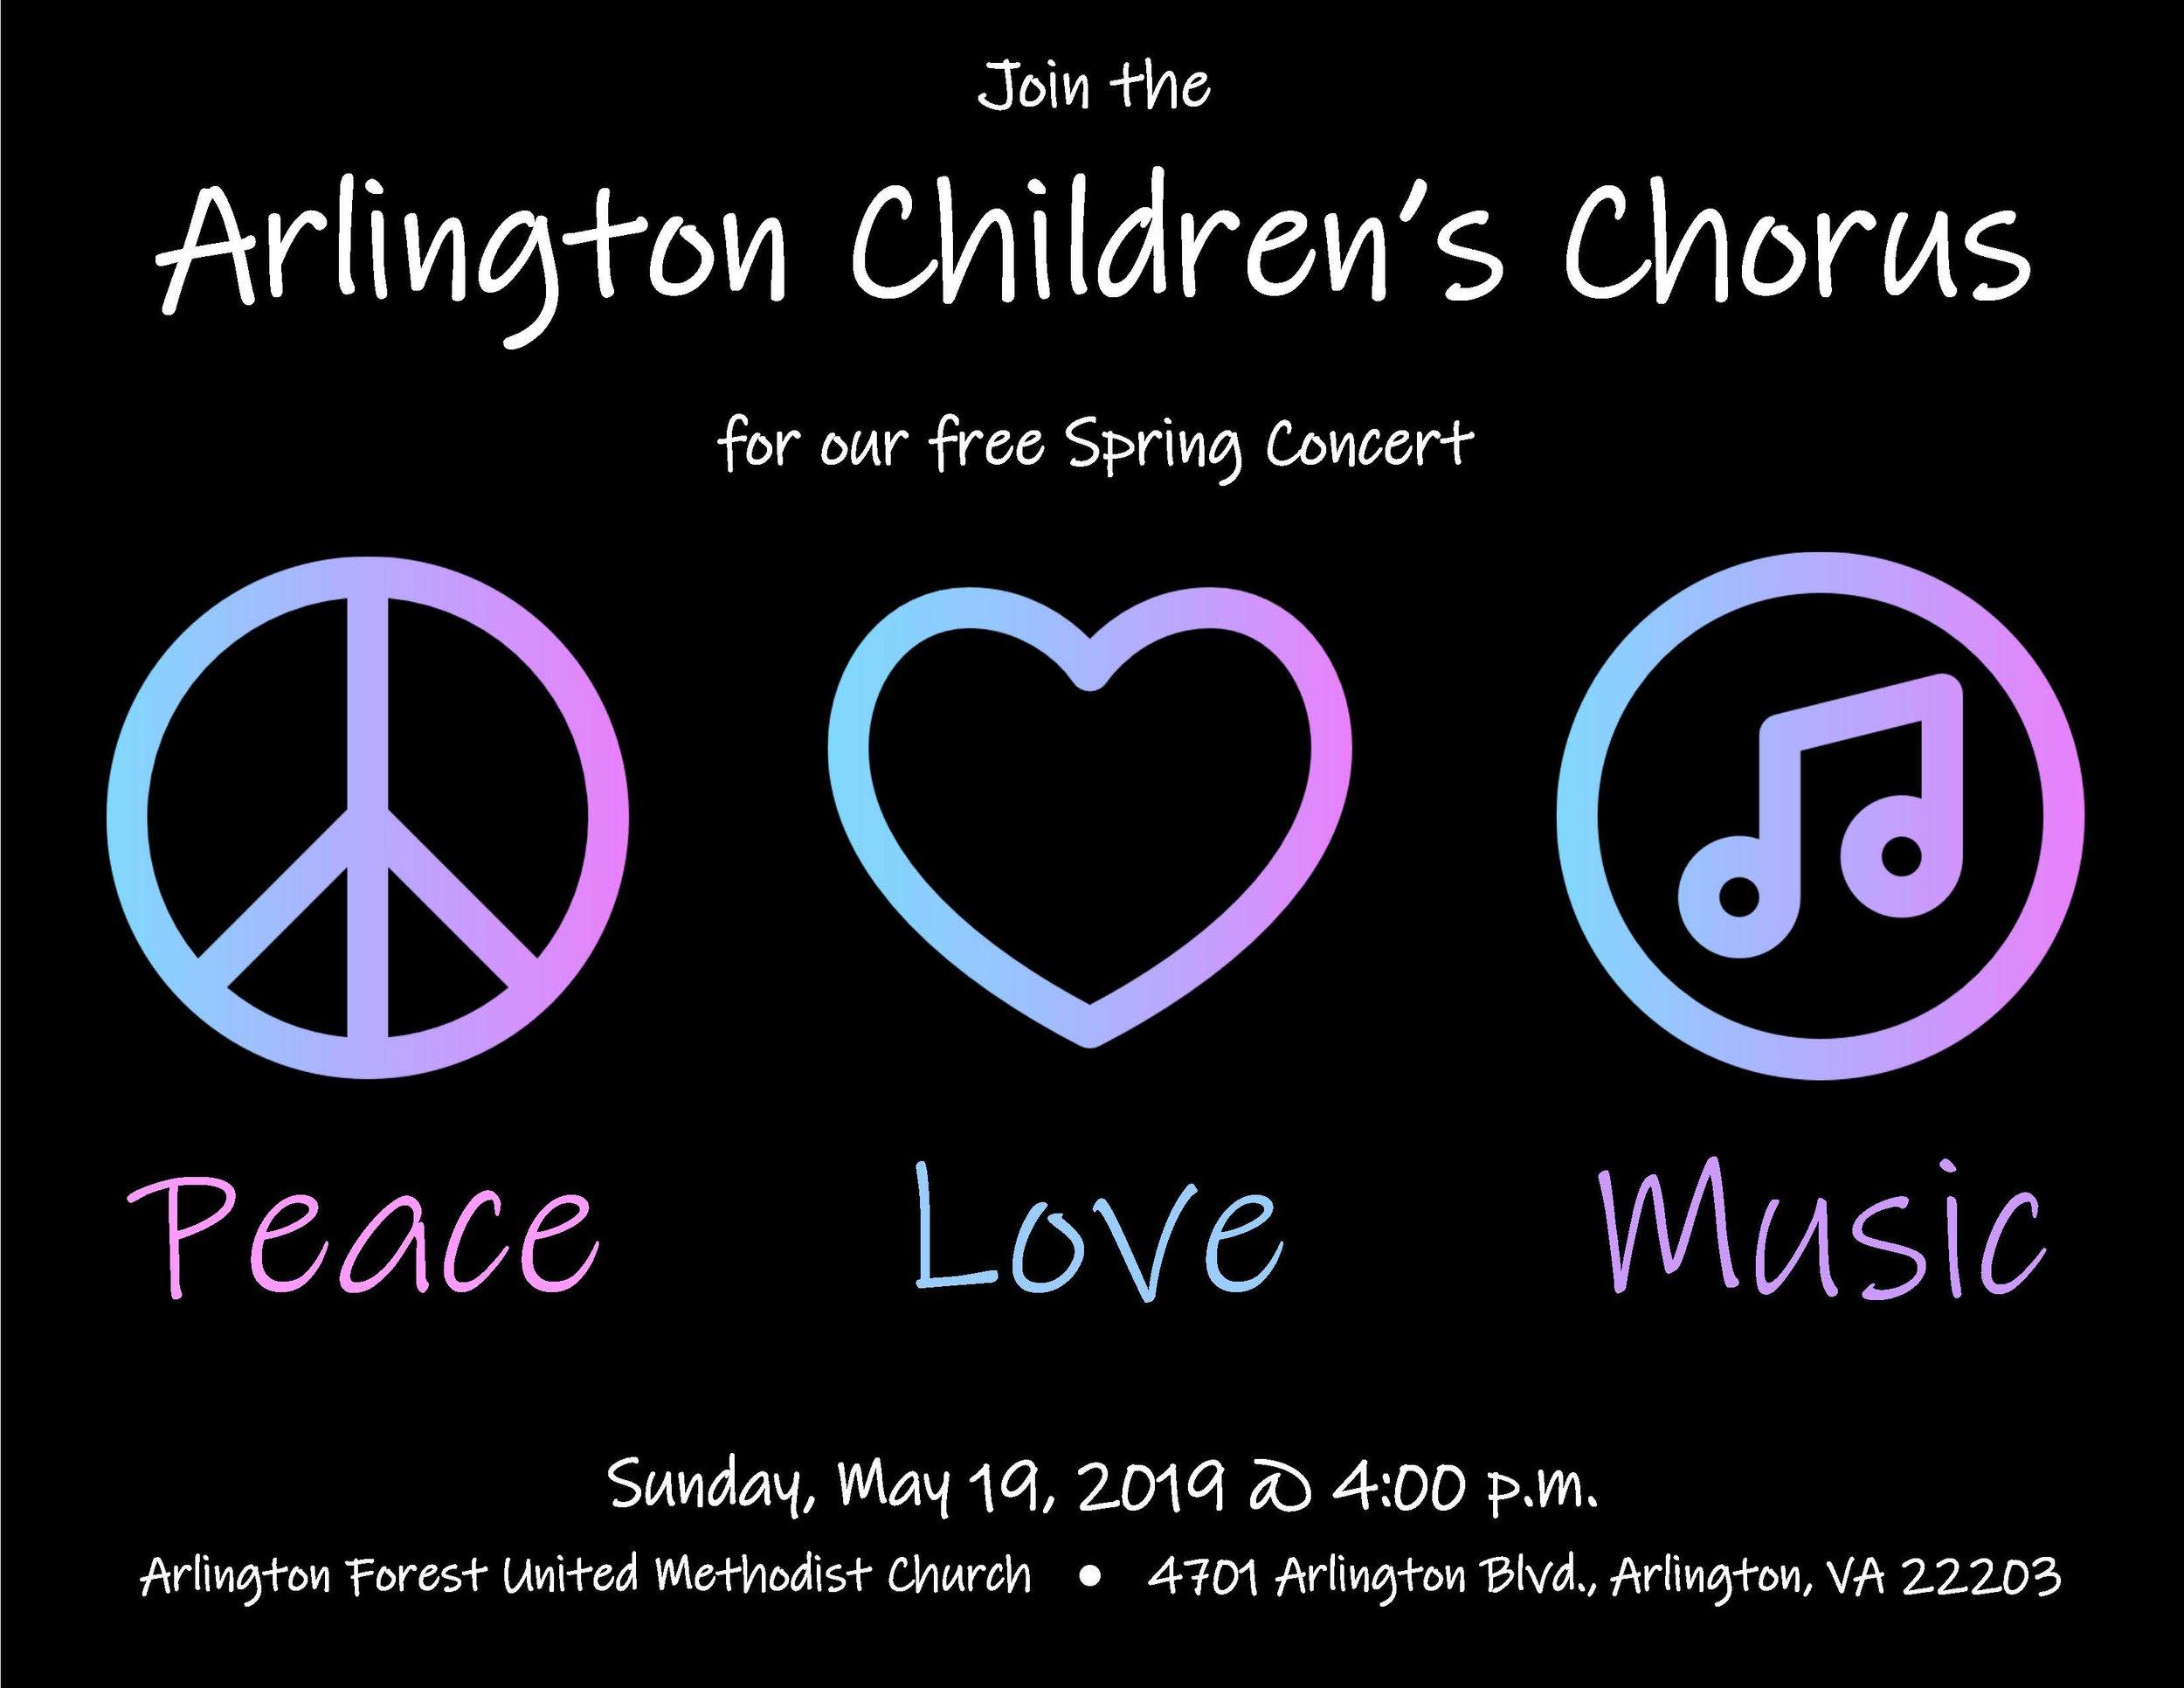 2019 Spring Concert Flier 03-25-19.jpg